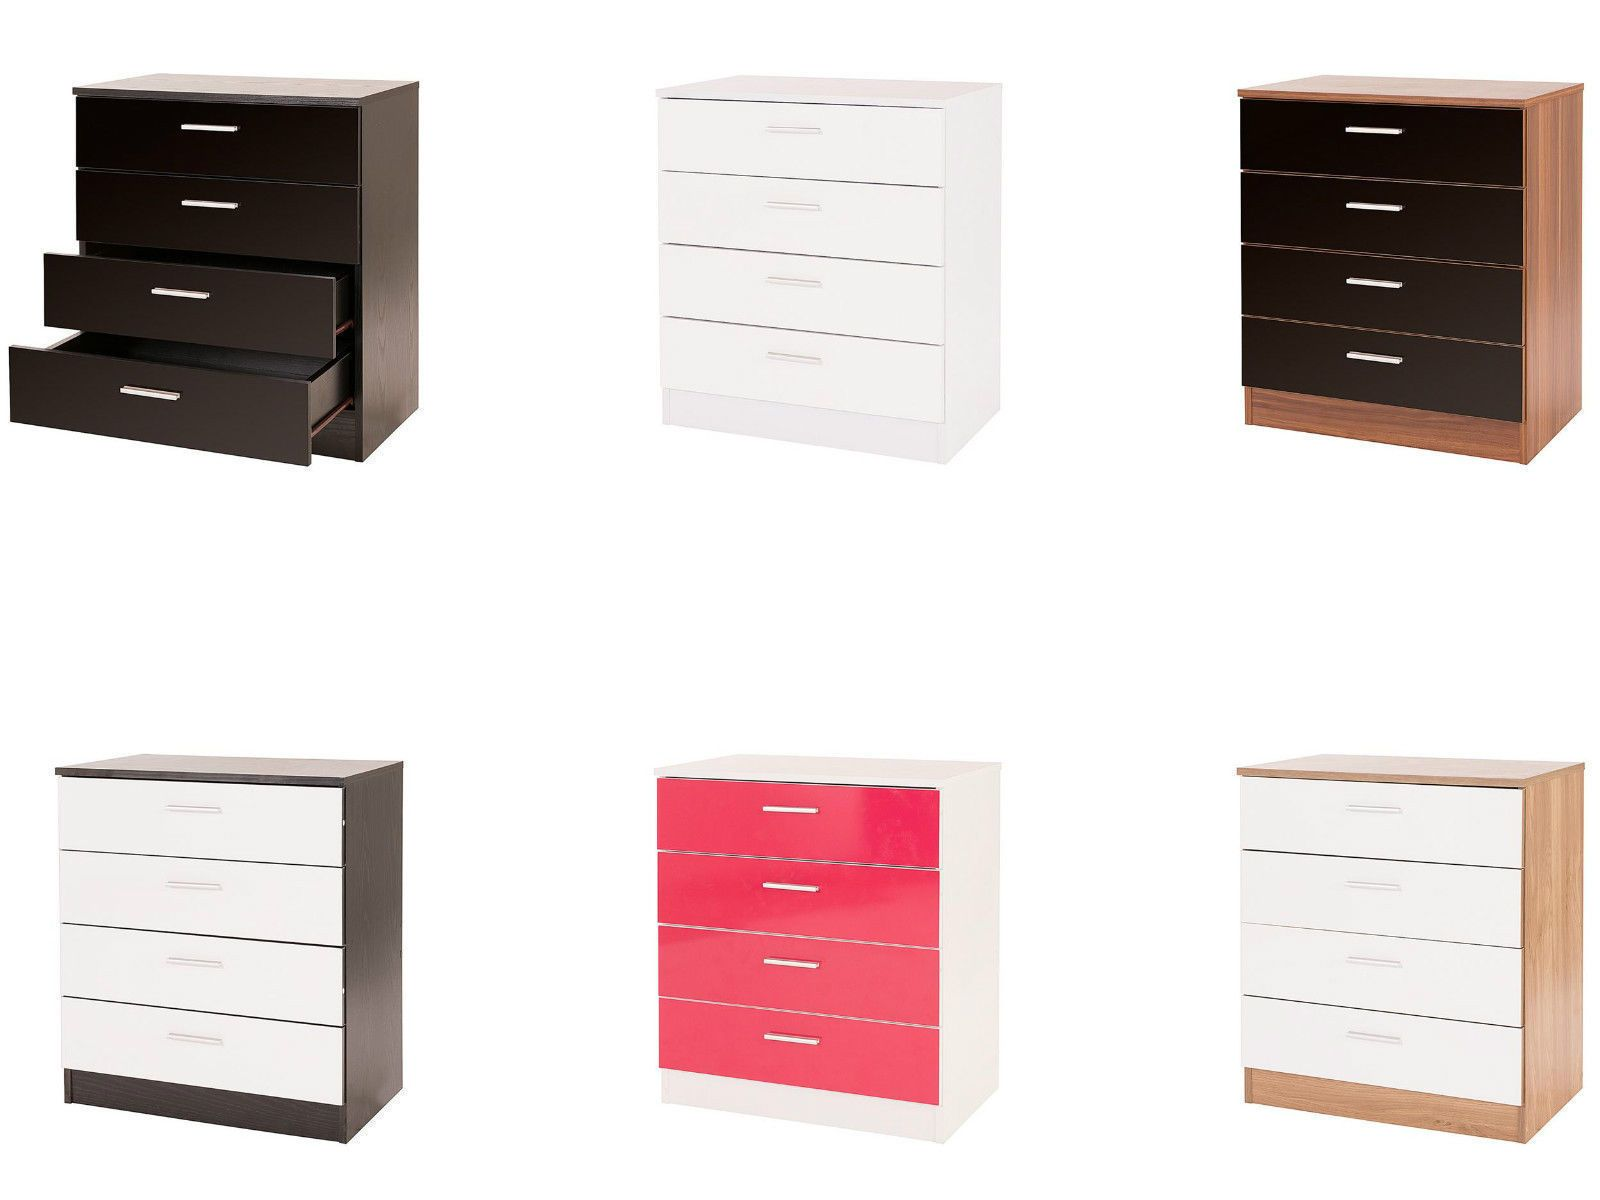 Details about NEW Caspian High Gloss Bedroom Furniture Set - Full ...